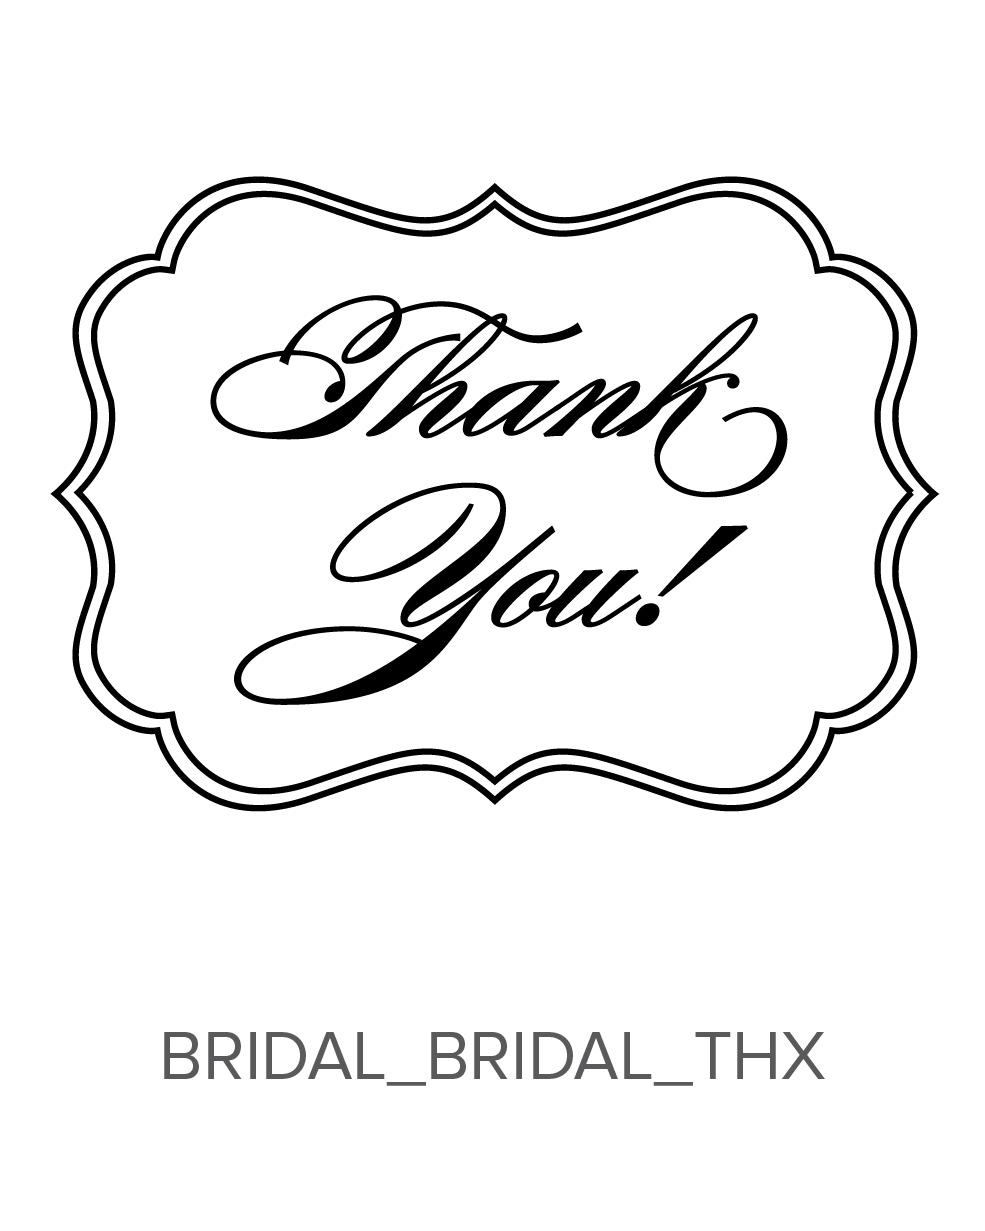 Mix and Match_bridal-54.jpg